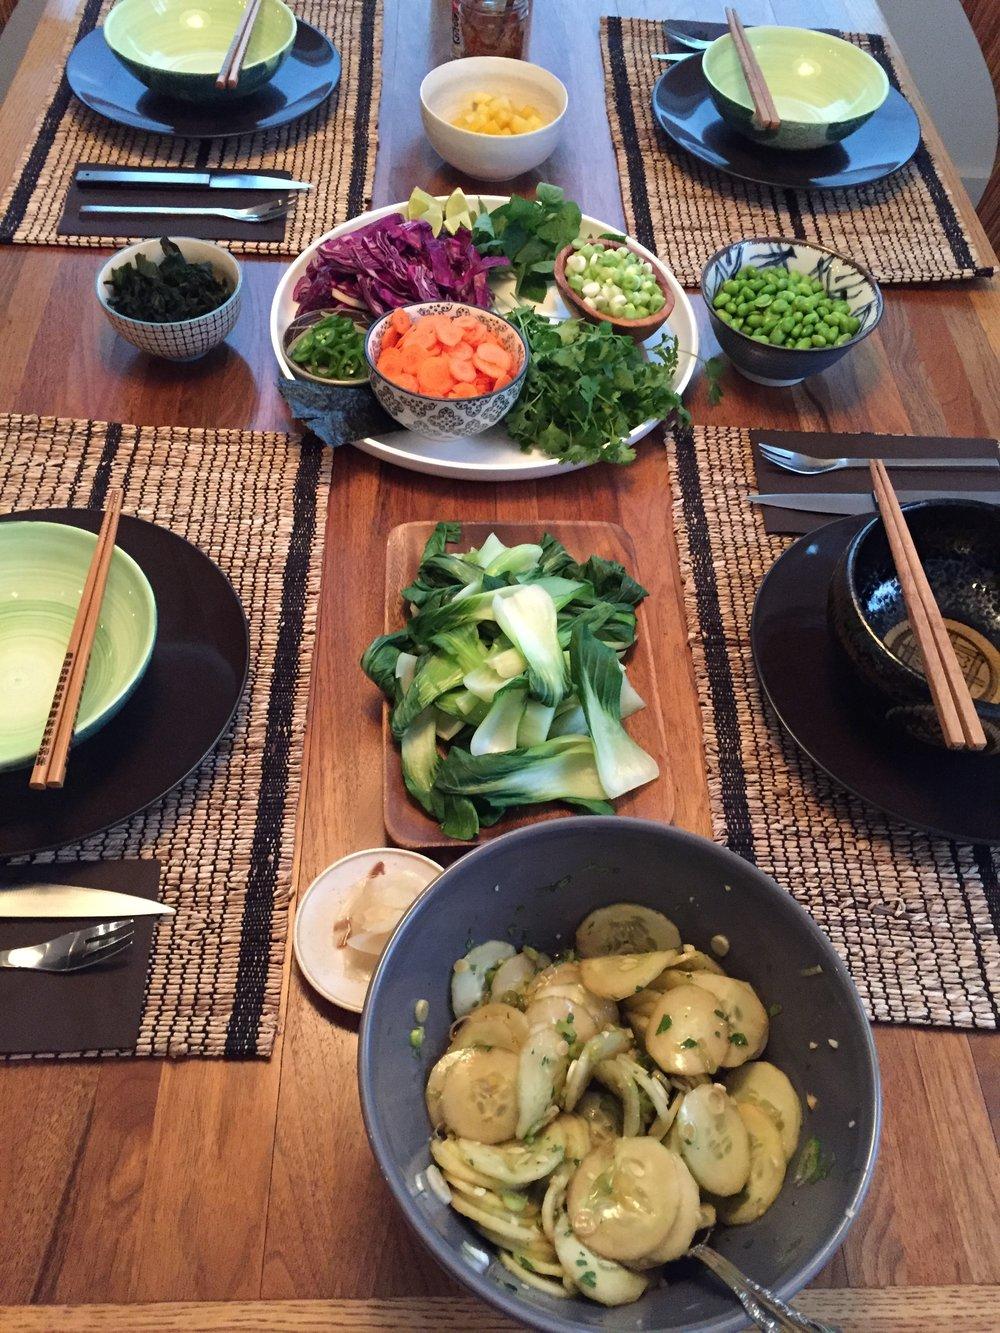 asian-bowl-inspiration-lauren-schwaiger-lifestyle-blog.jpg